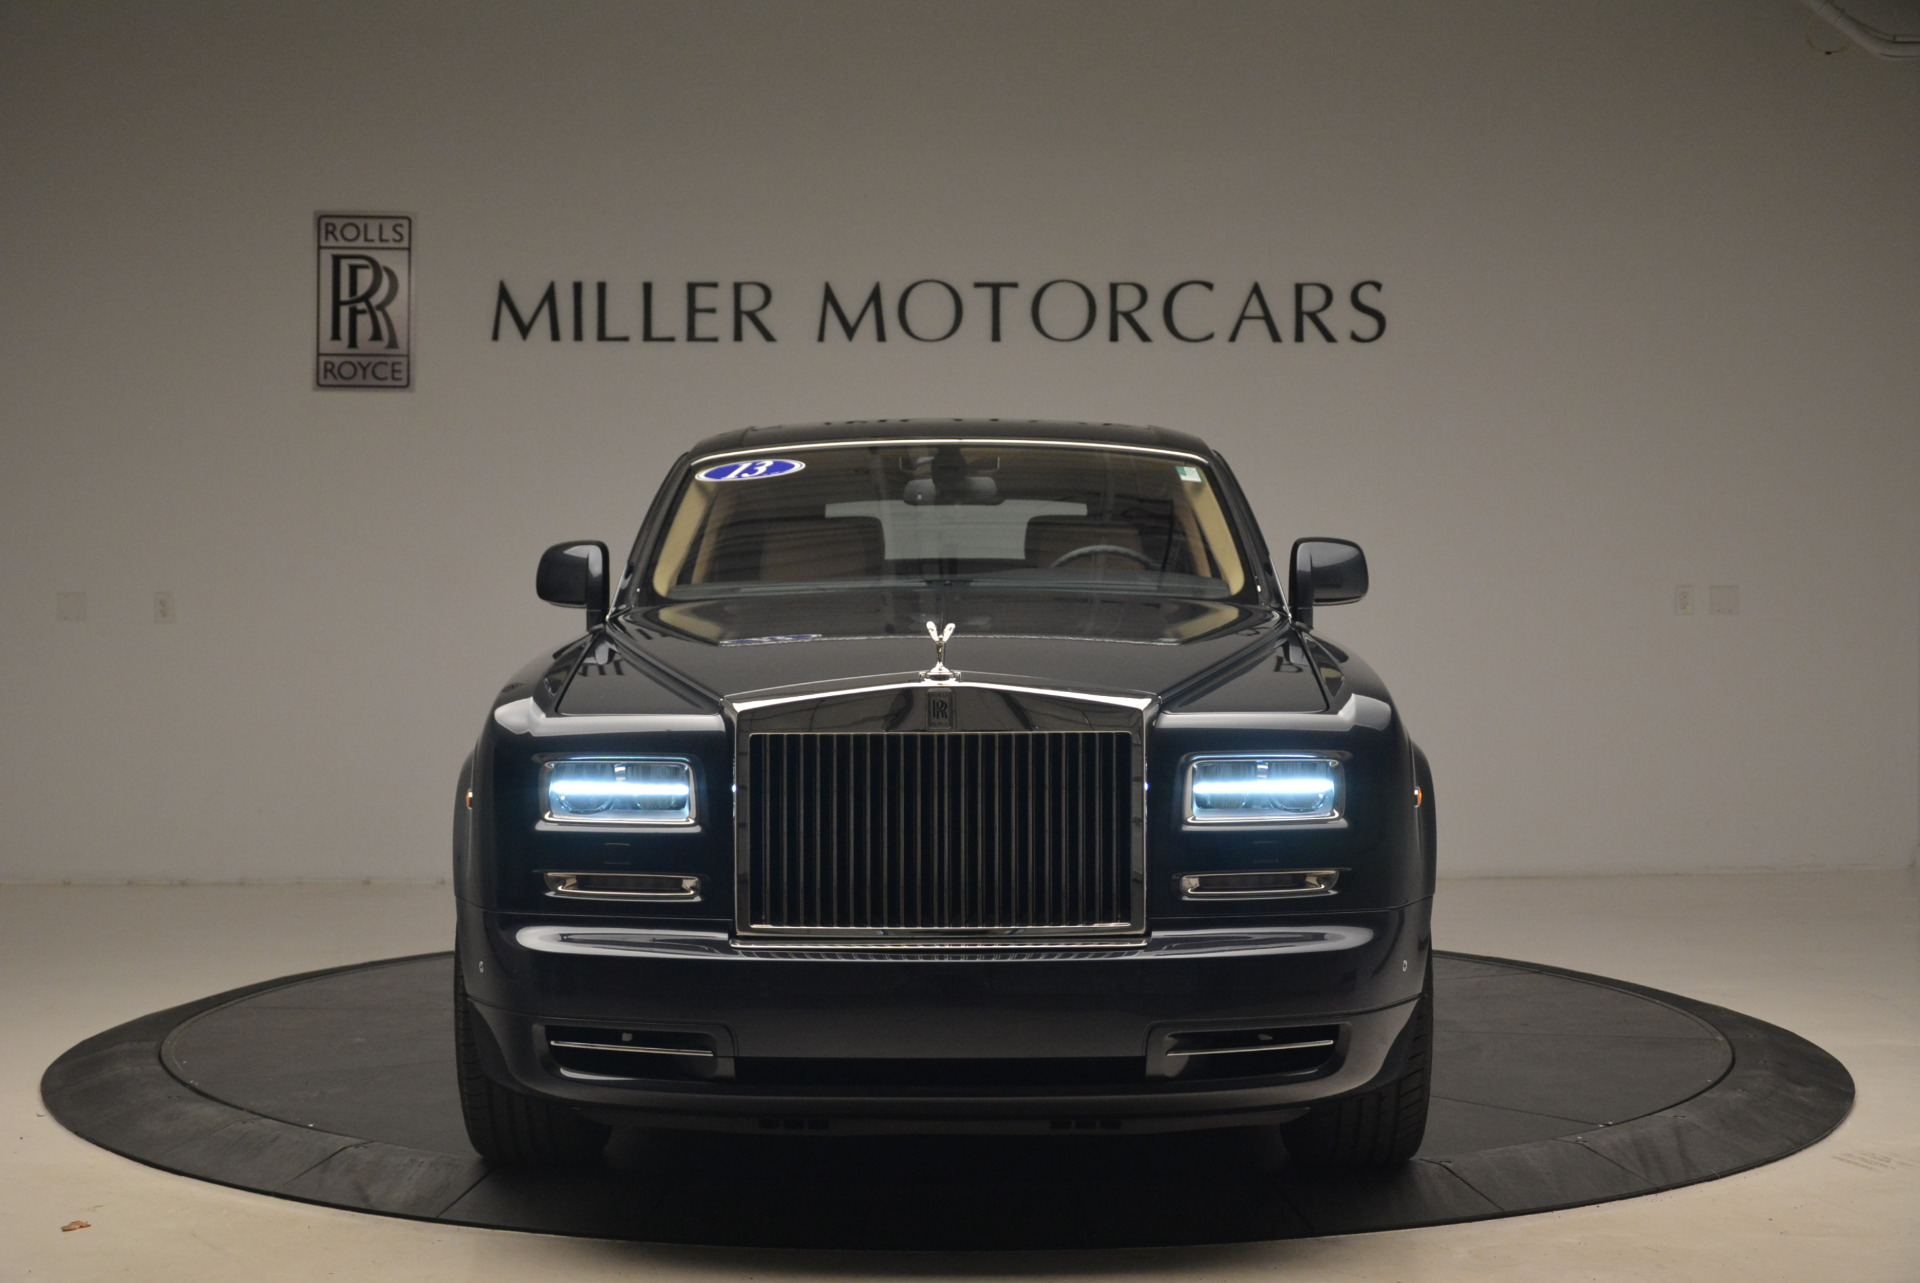 Used 2013 Rolls-Royce Phantom  For Sale In Greenwich, CT. Alfa Romeo of Greenwich, 7353 2208_p3